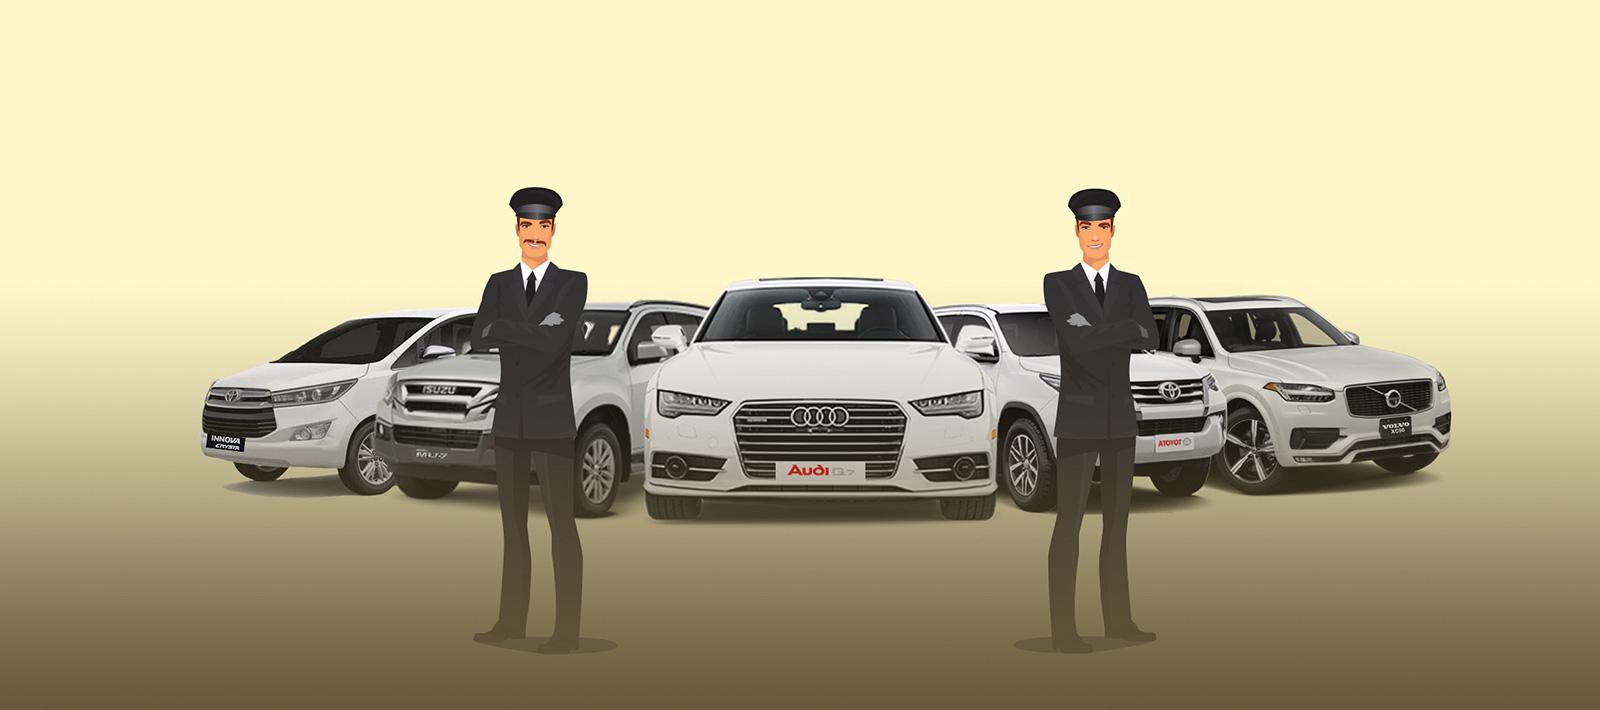 Professional Chauffeur Driven Car Rentals In Hyderabad Noori Travels